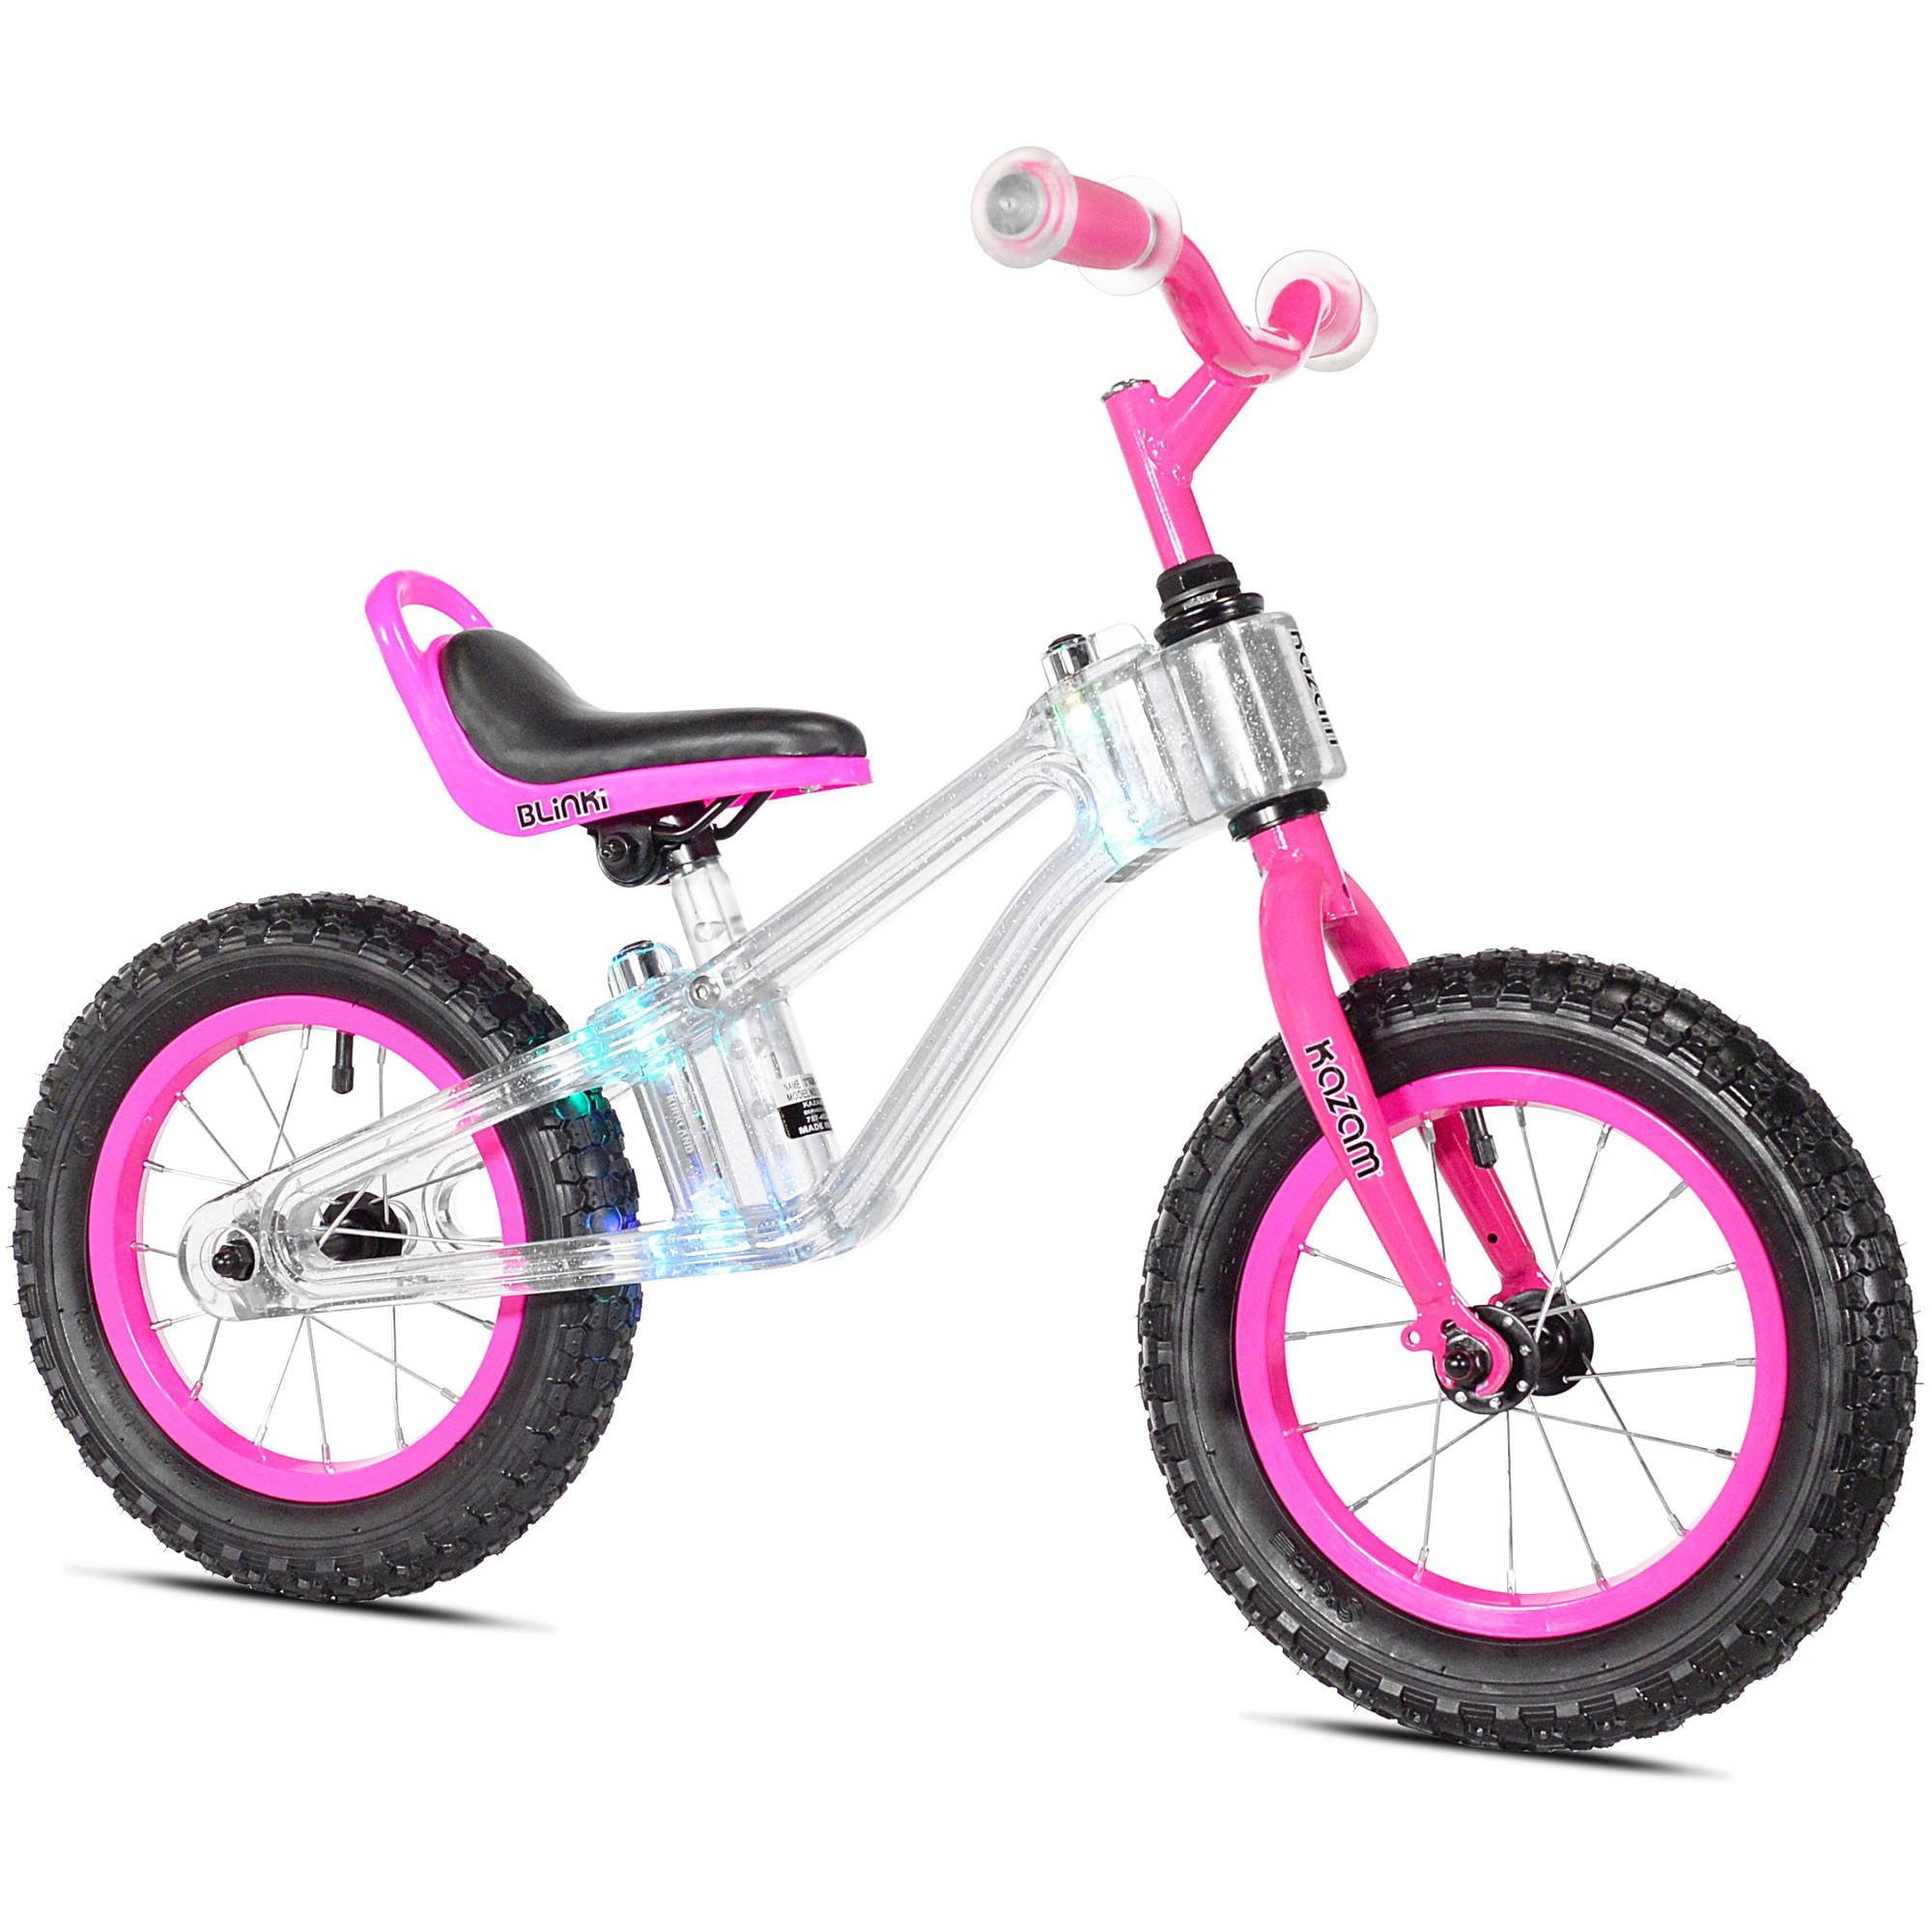 "KaZAM 12"" Child's, Blinki Balance Bike, Purple, For Ages 2-5"